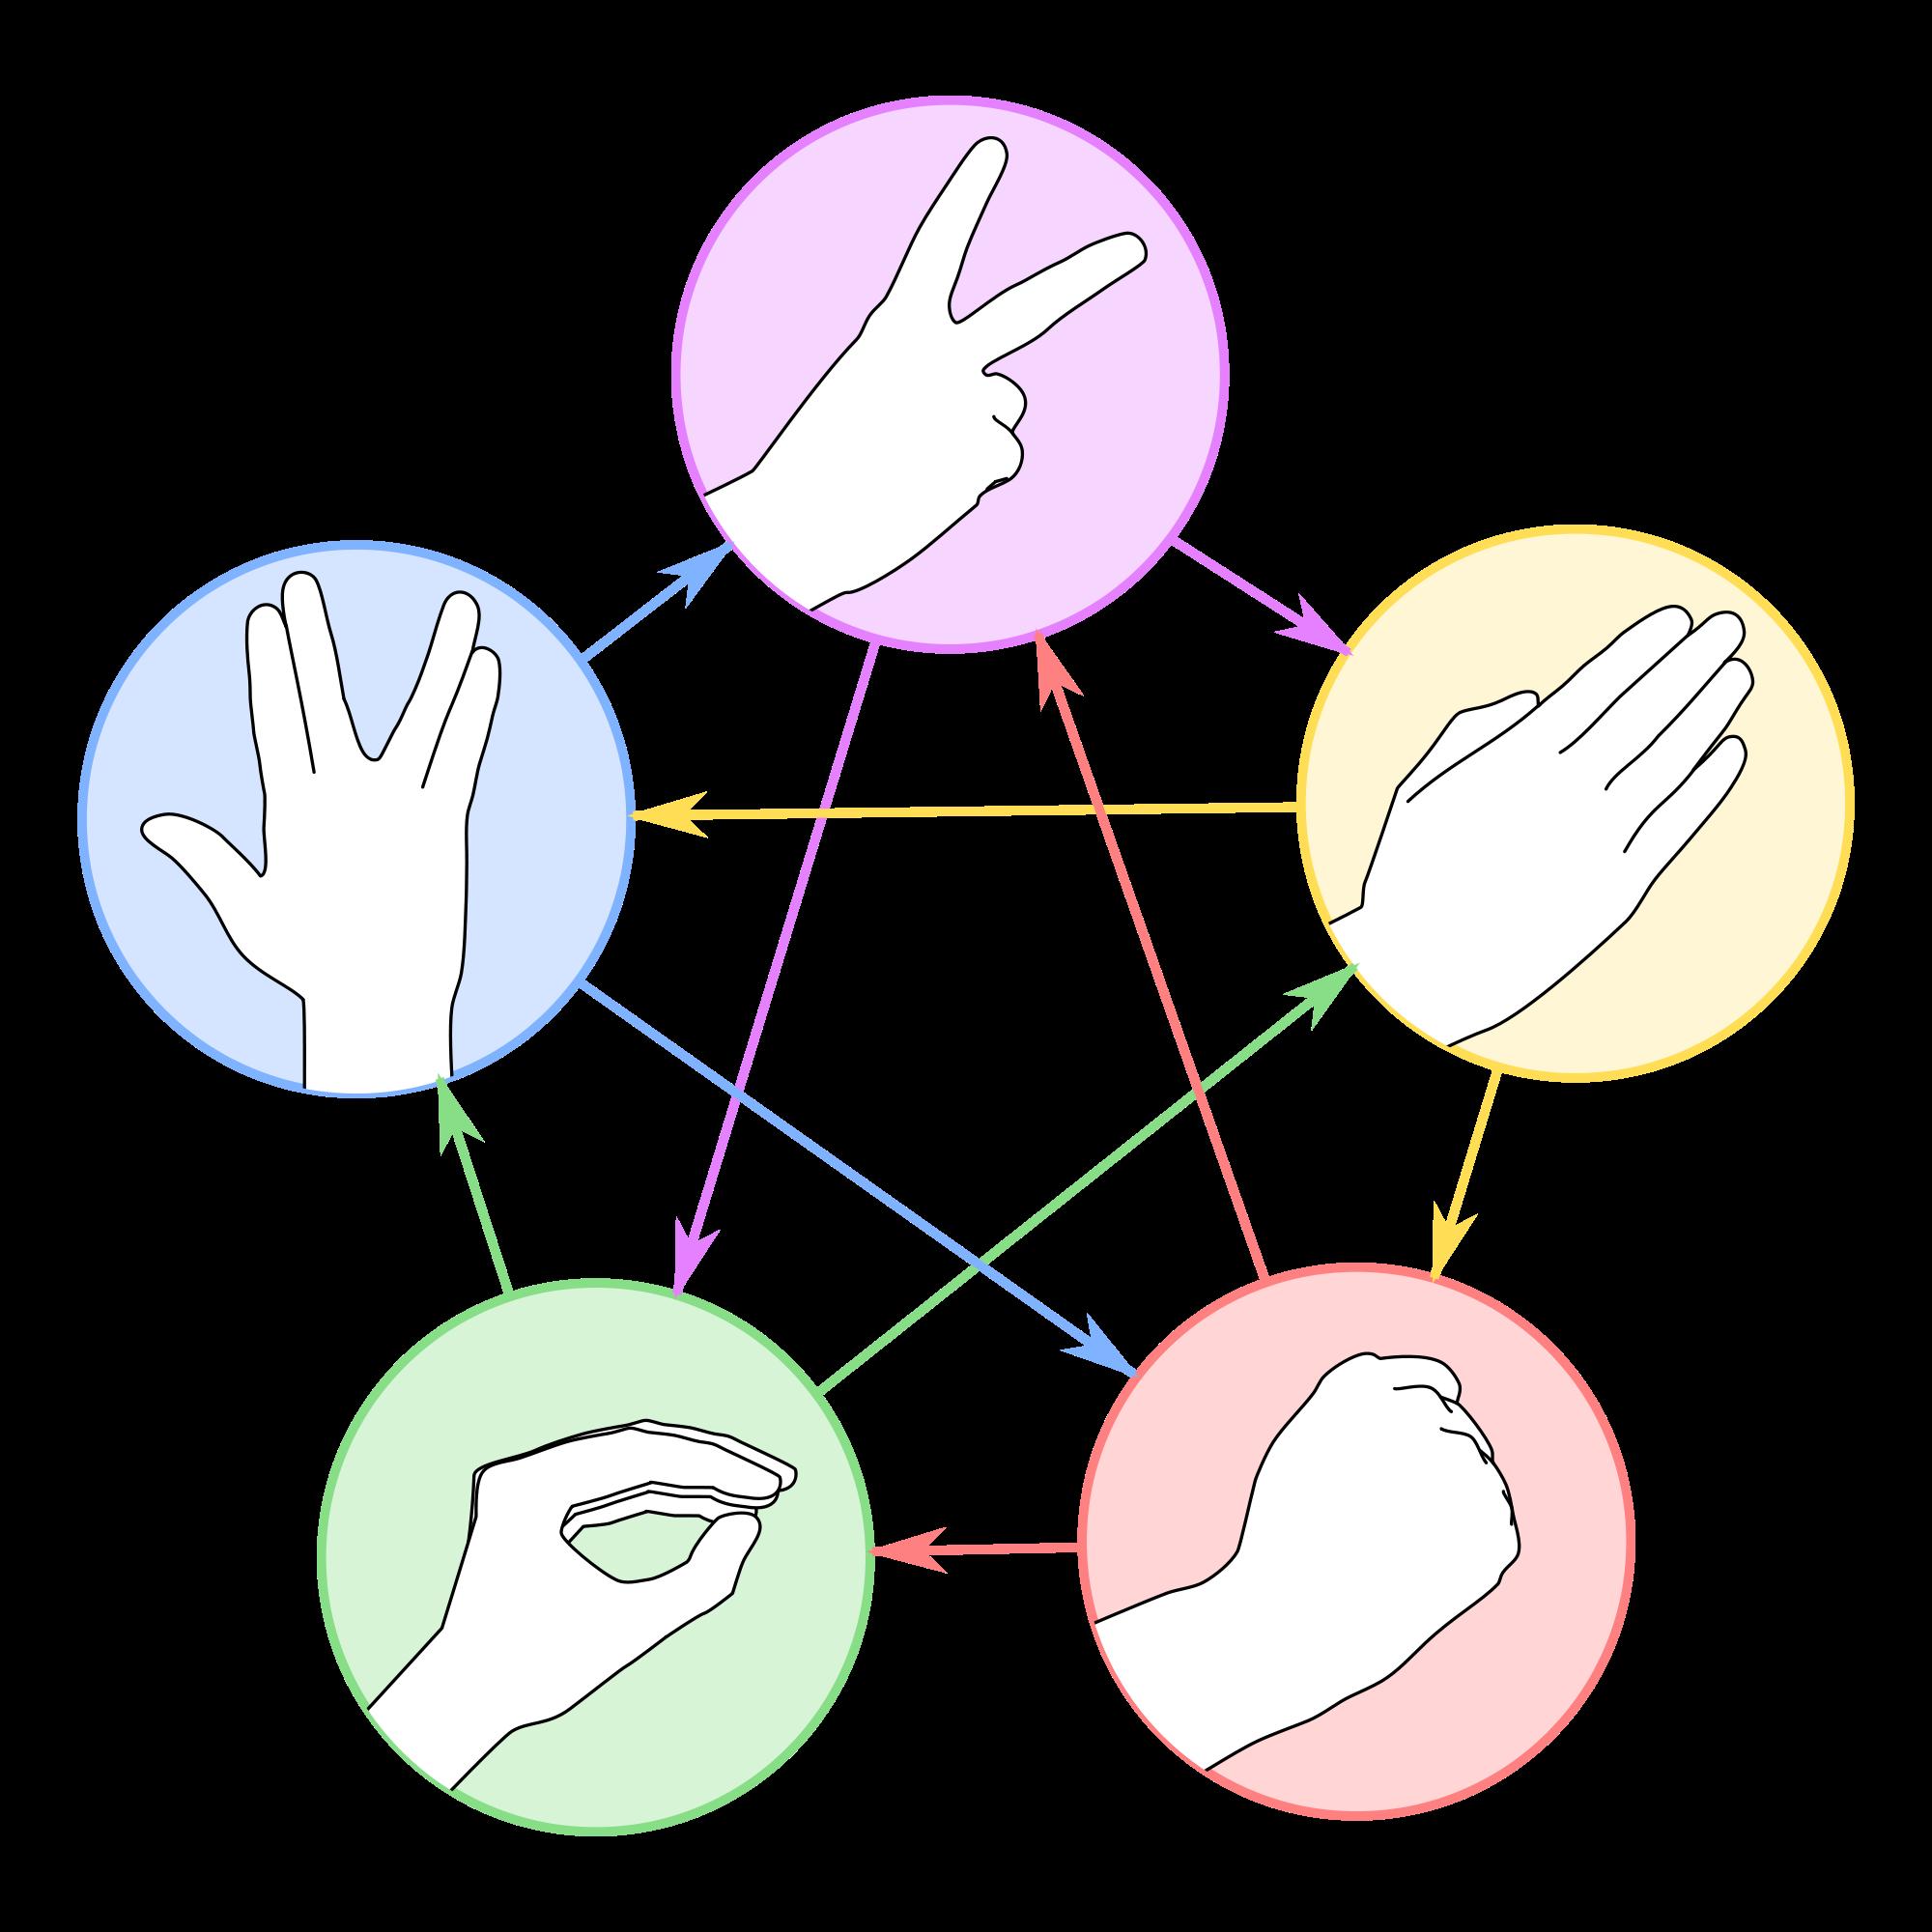 Lizard diagram